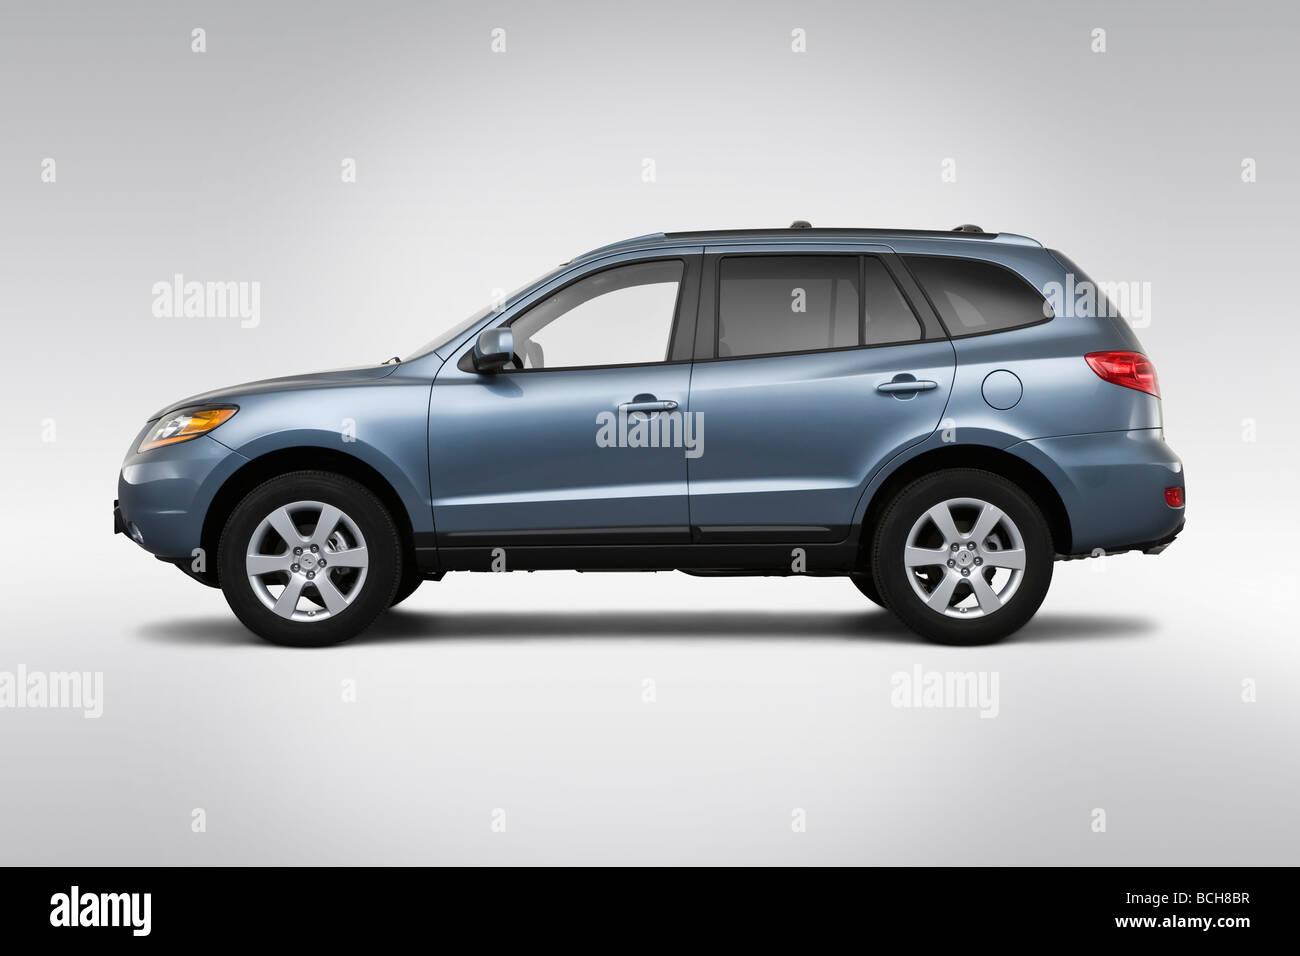 2009 Hyundai Santa Fe SE in Blue - Drivers Side Profile - Stock Image